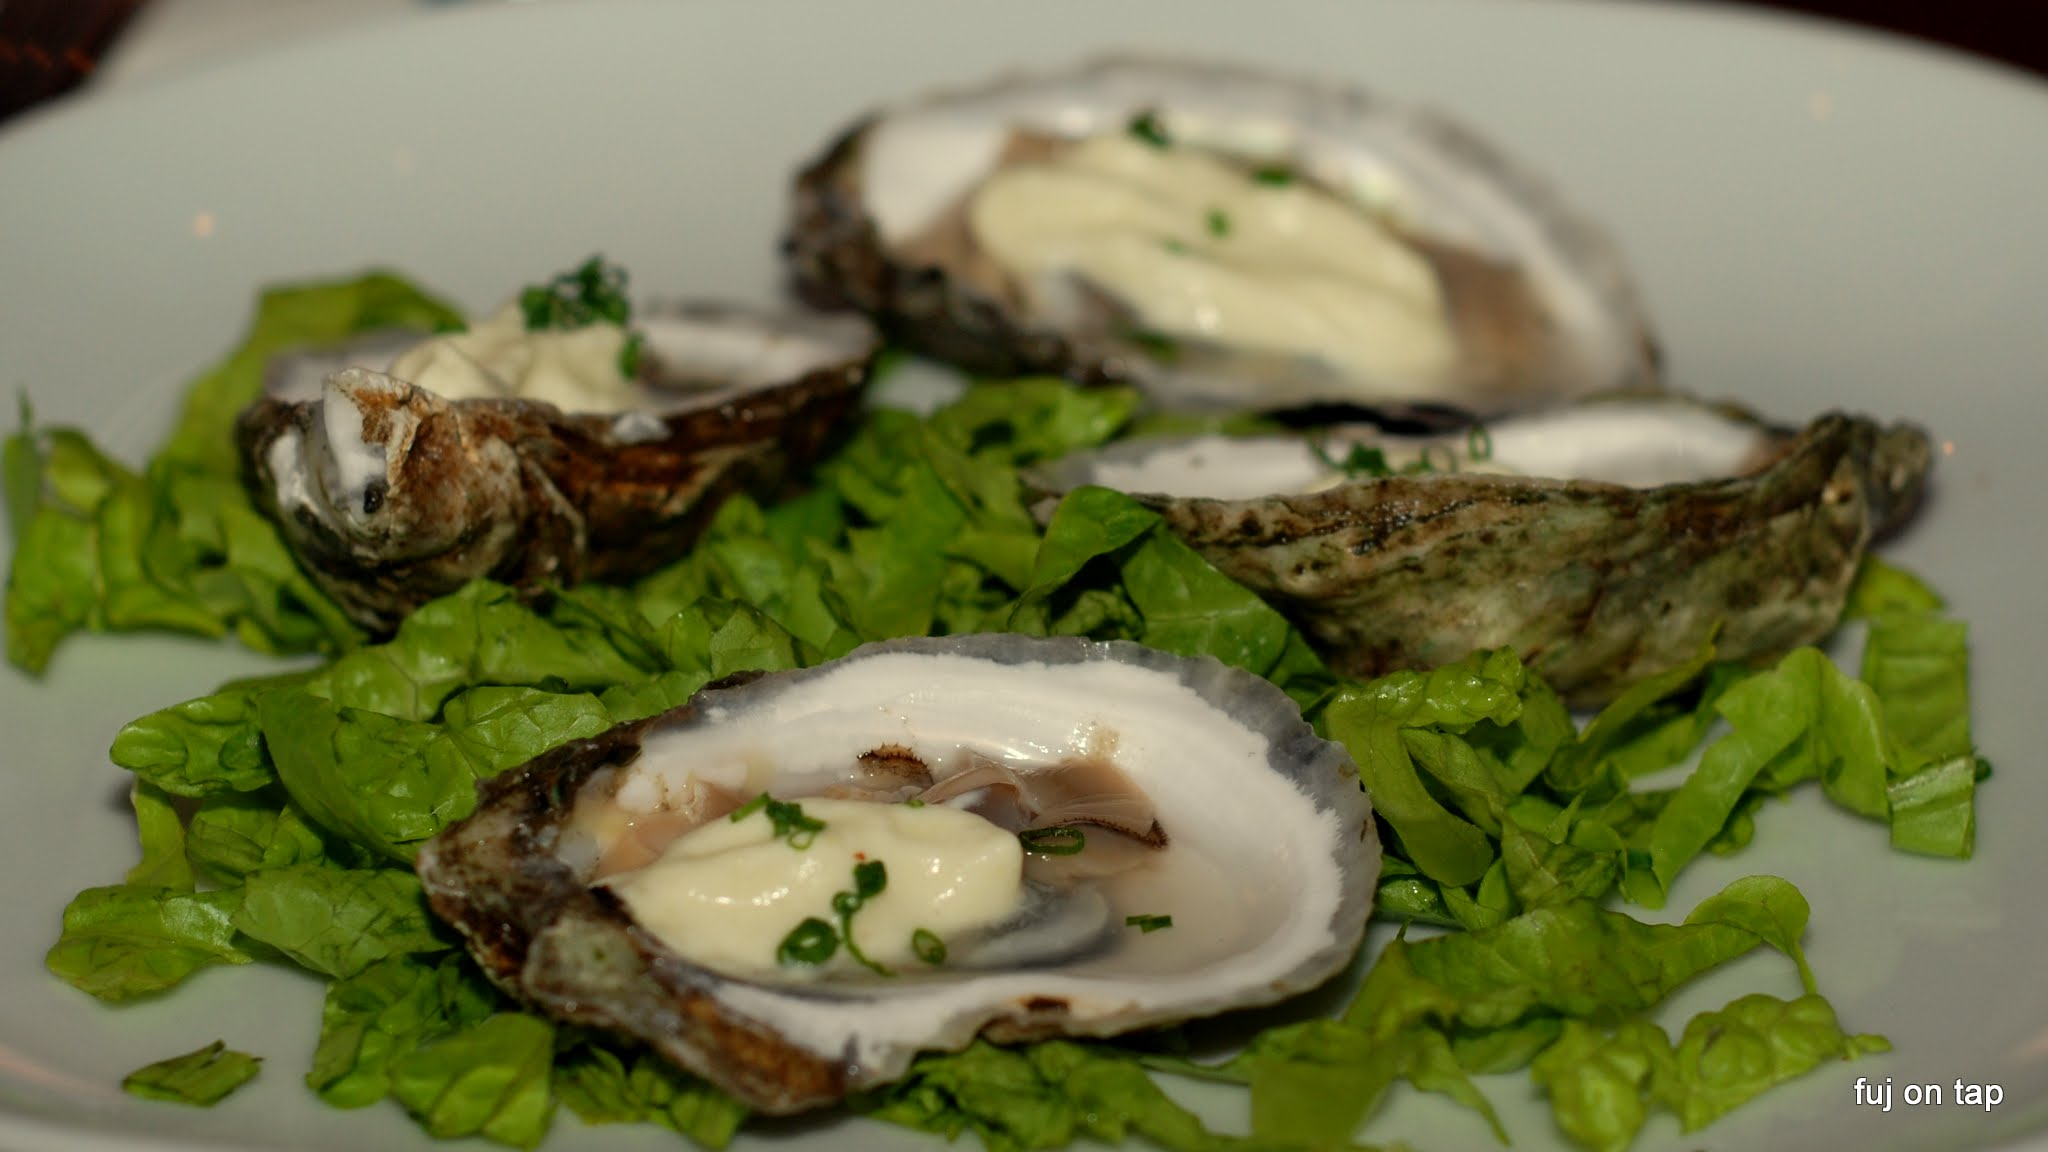 Woodbury Wellfleet Oyster, Corn Foam, Crème Fraîche, Chive